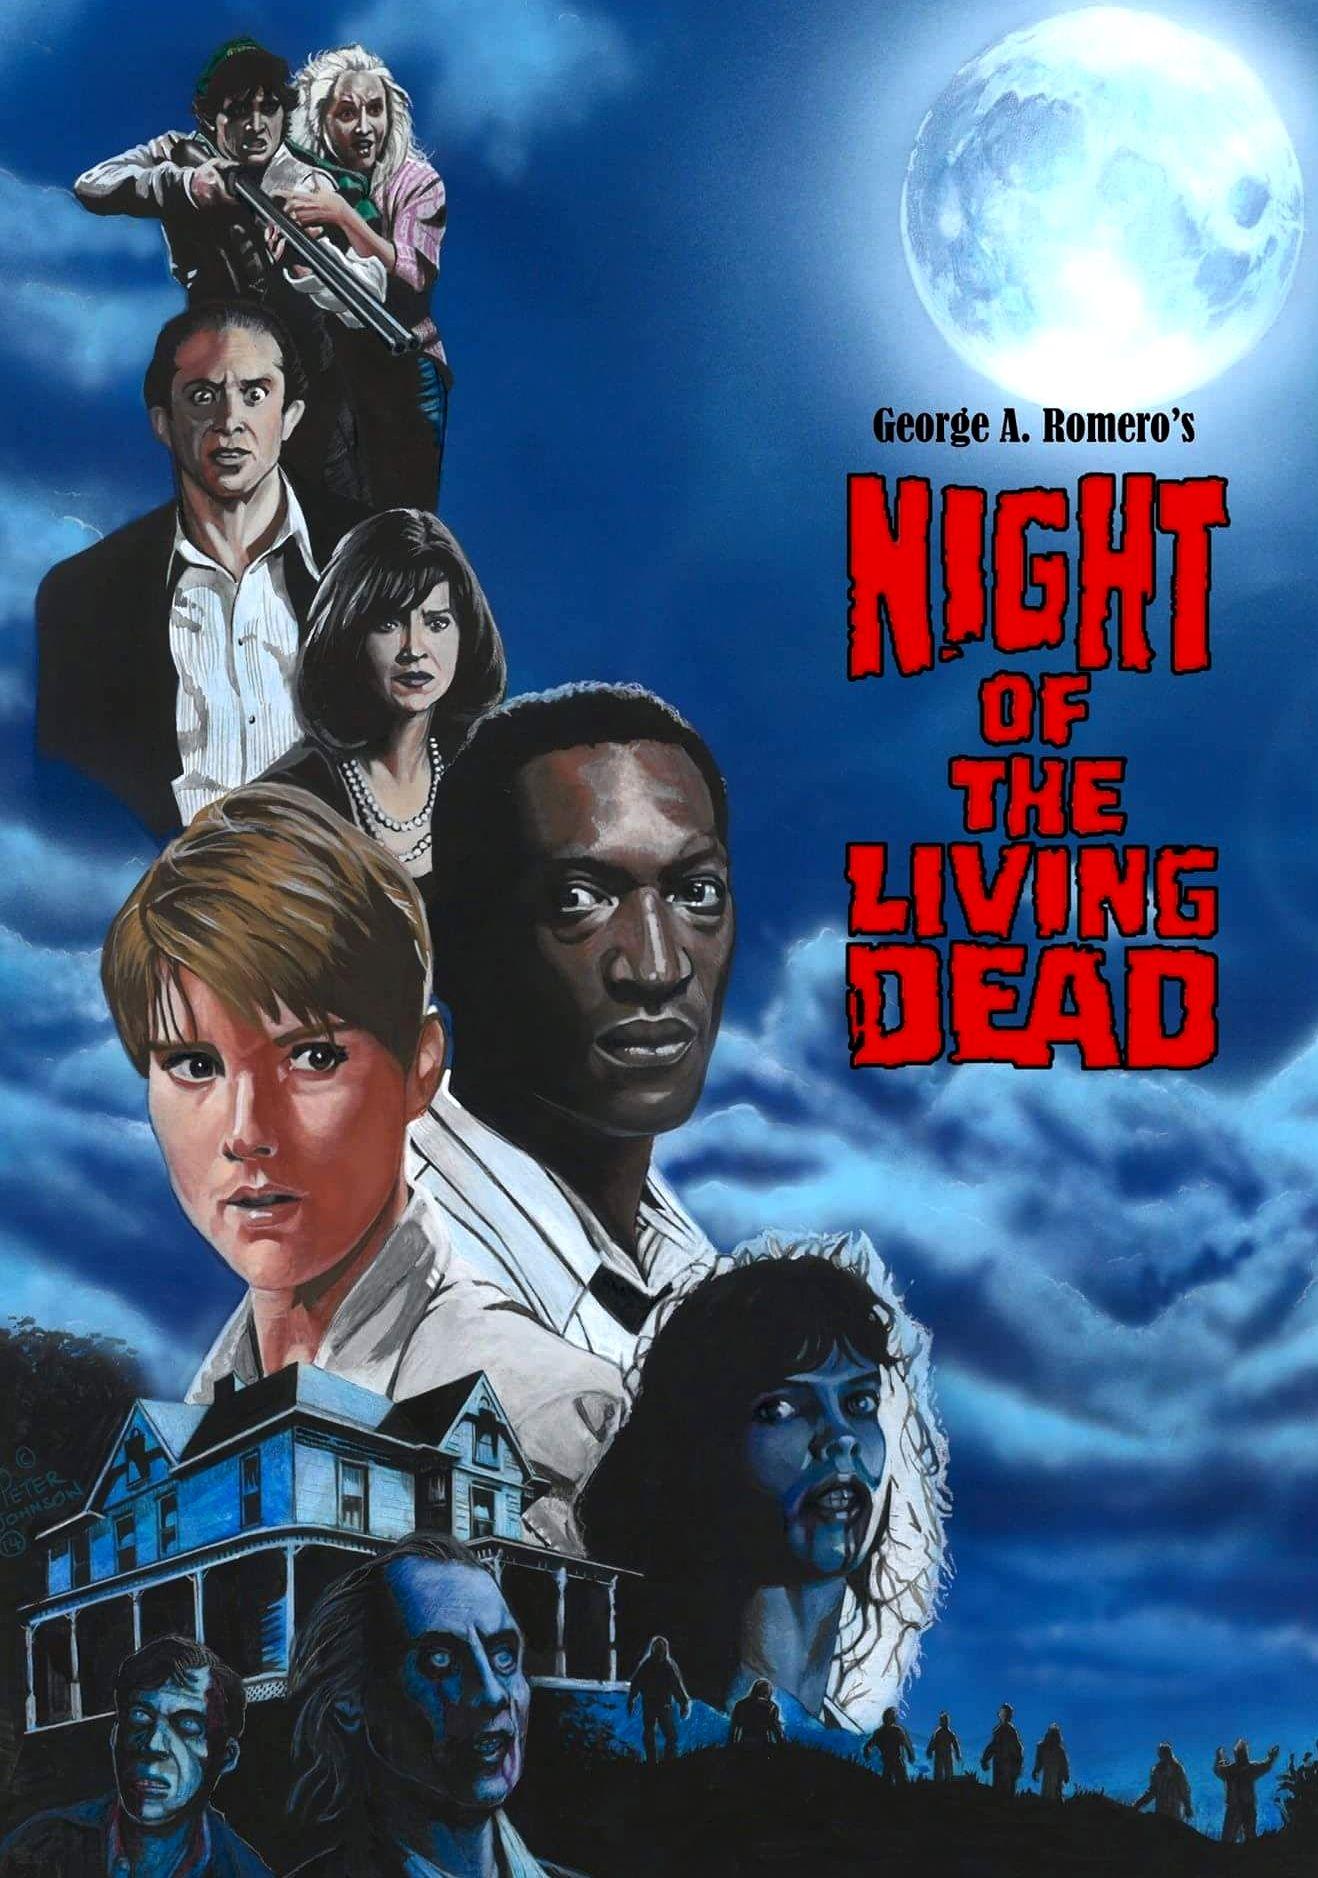 Night Of The Living Dead Películas Clásicas De Terror Peliculas De Terror Personajes De Terror